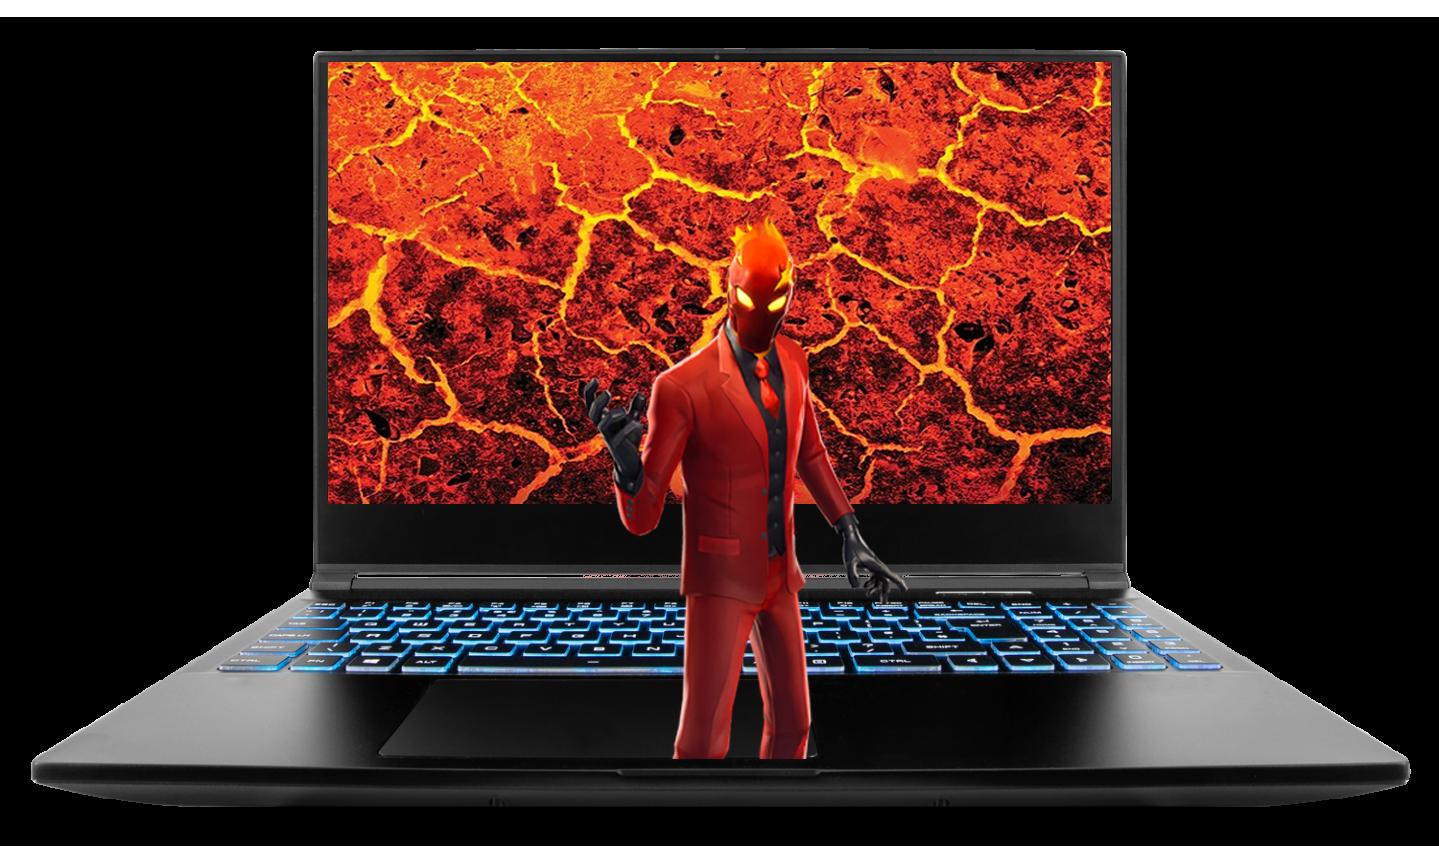 Front open 15.6 inch business gaming notebook / laptop XNB XNotebooks INFERNO TL15 ALU NVIDIA GTX 1650 / RTX 3050 / RTX 3050 Ti CPU INTEL i7-11800H Tongfang GM5TG5O GM5TGEO GM5TGFO